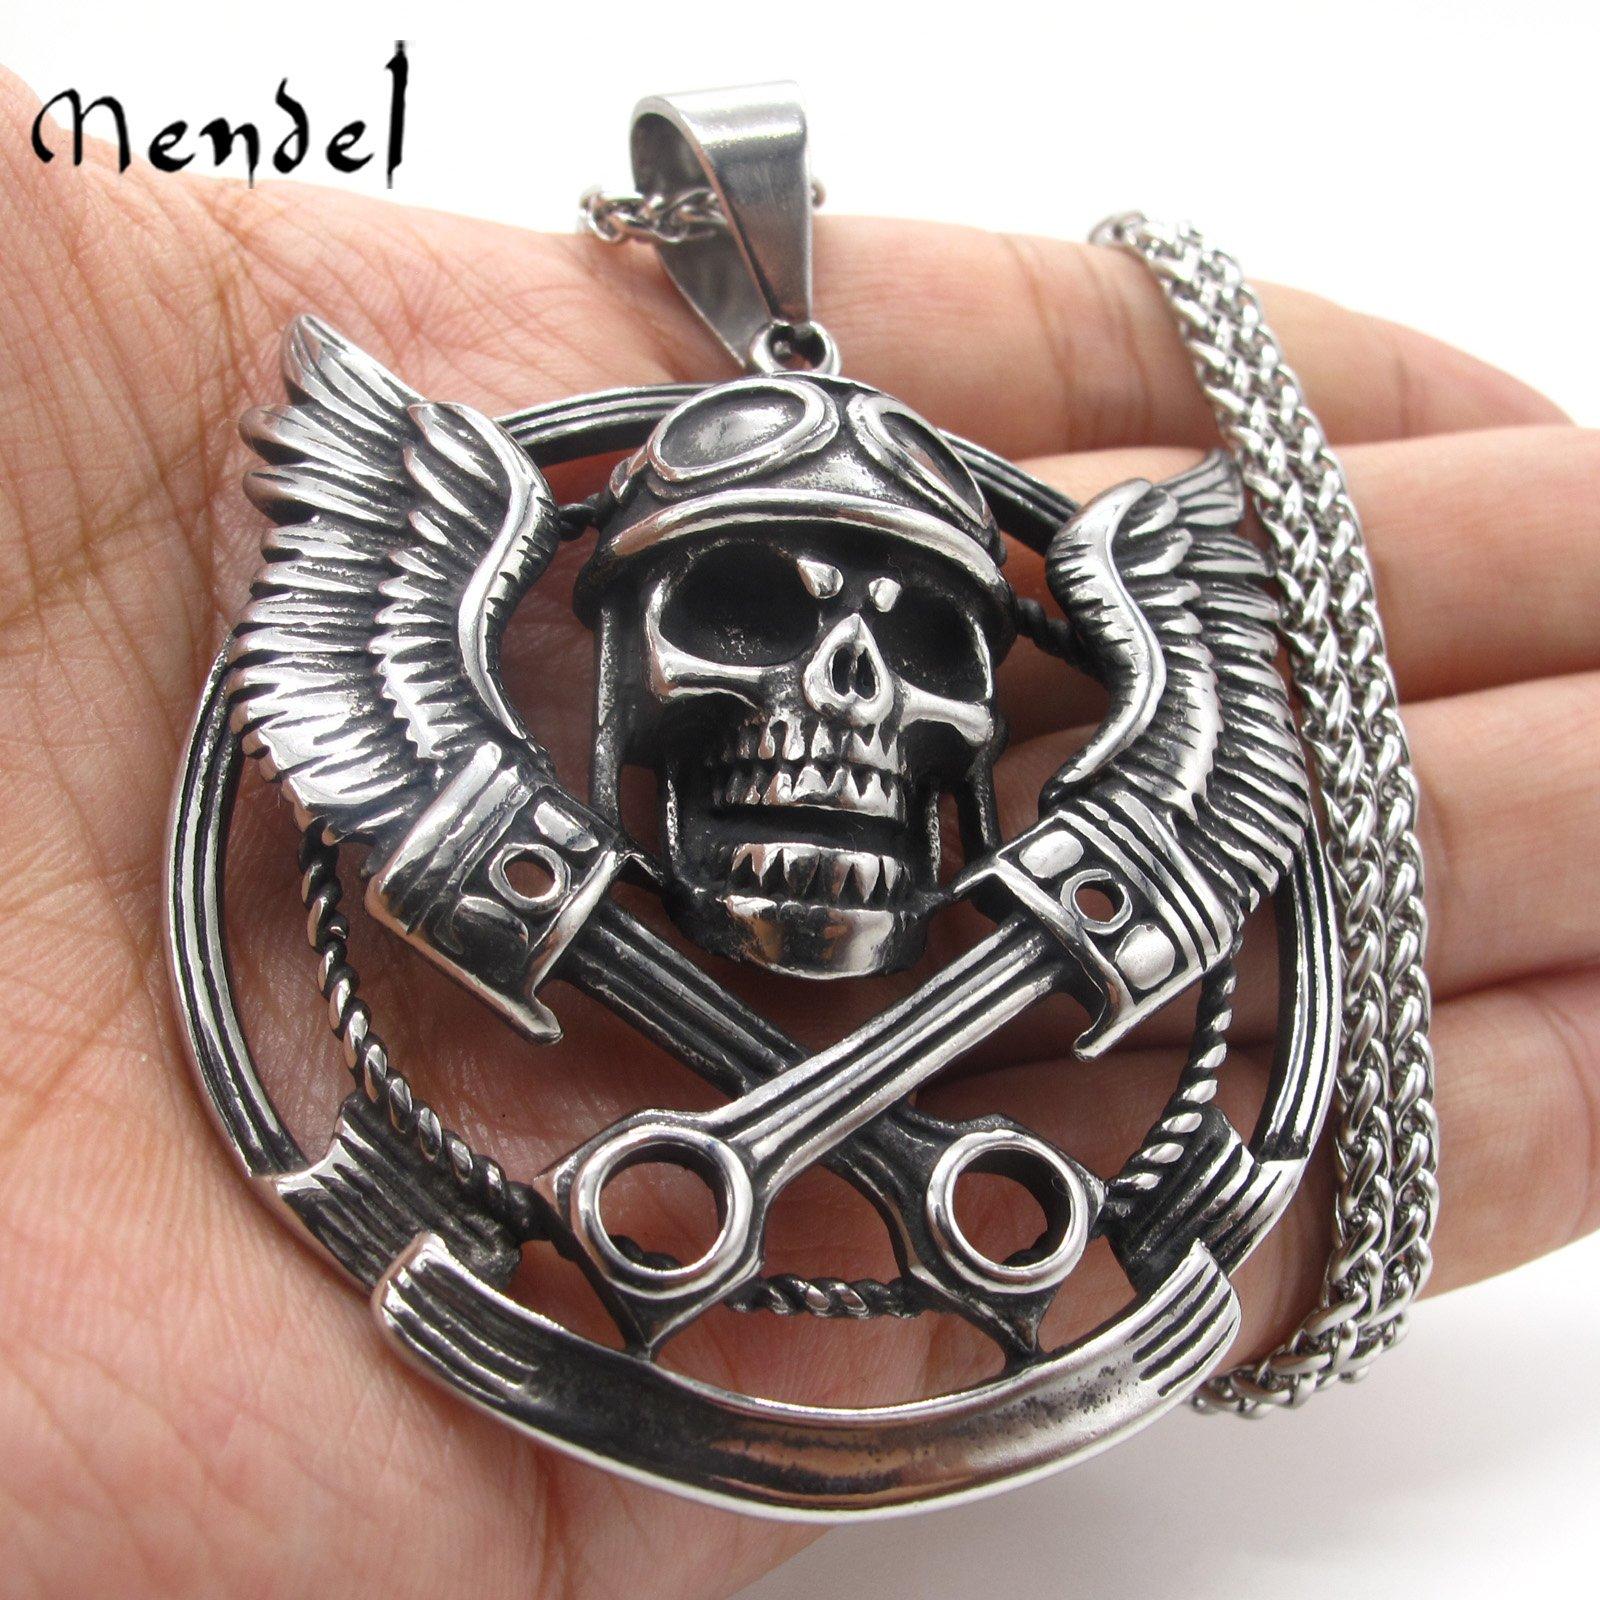 MENDEL Mens 30 Inch Motorcycle Club Biker Skull Pendant Necklace Stainless Steel